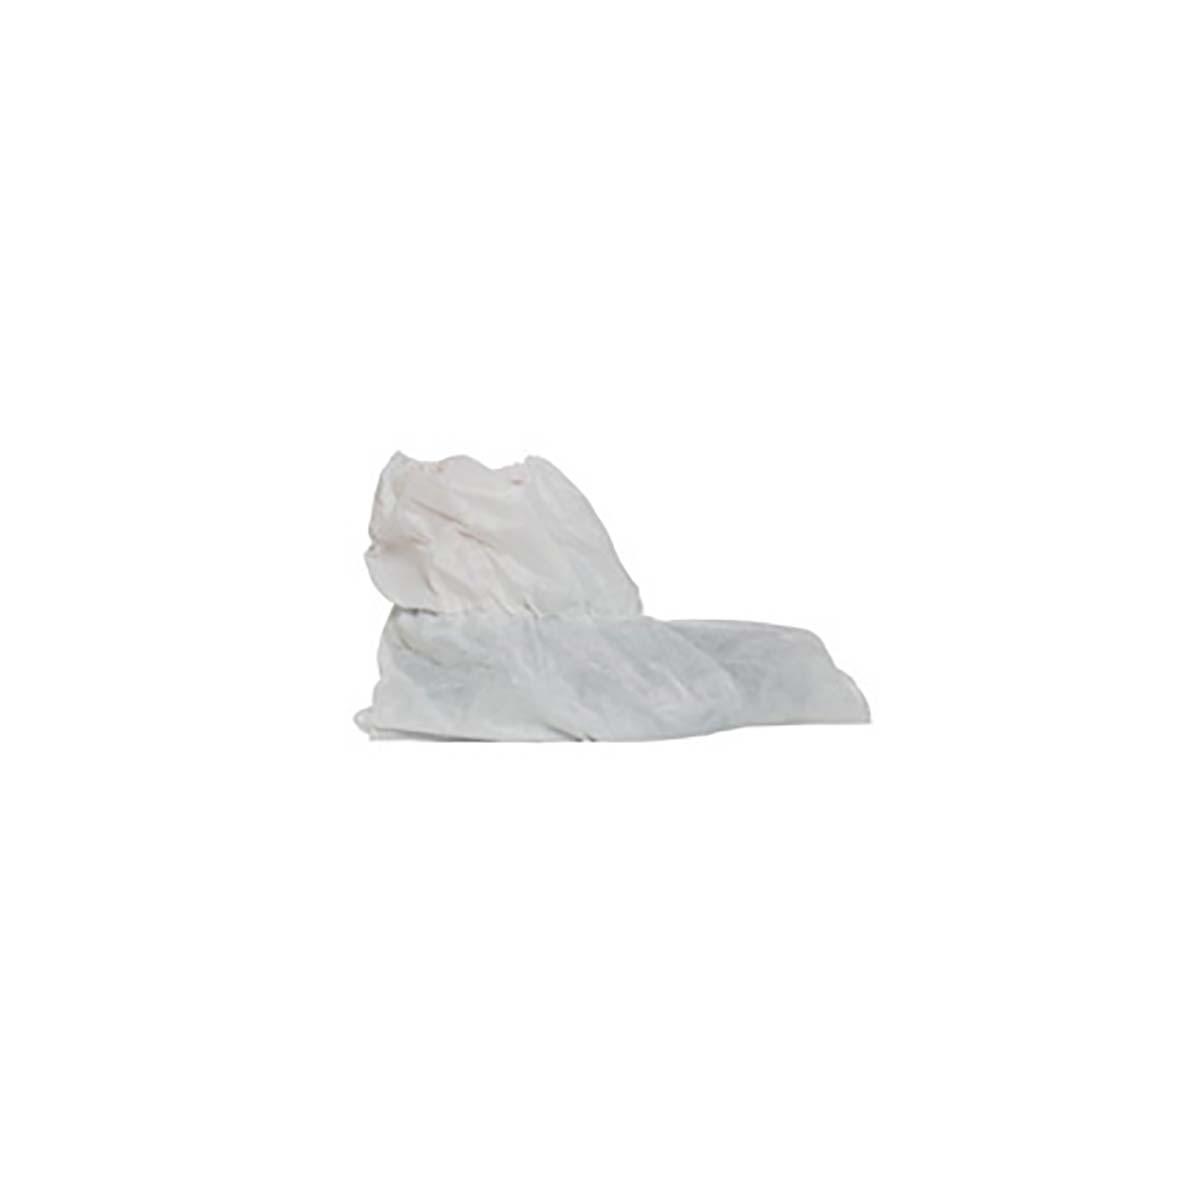 "PROSHIELD 40  SHOE COVER  SERGED SEAMS  ELASTIC OPENING  5.5"""" HIGH  WHITE  200/BOX"